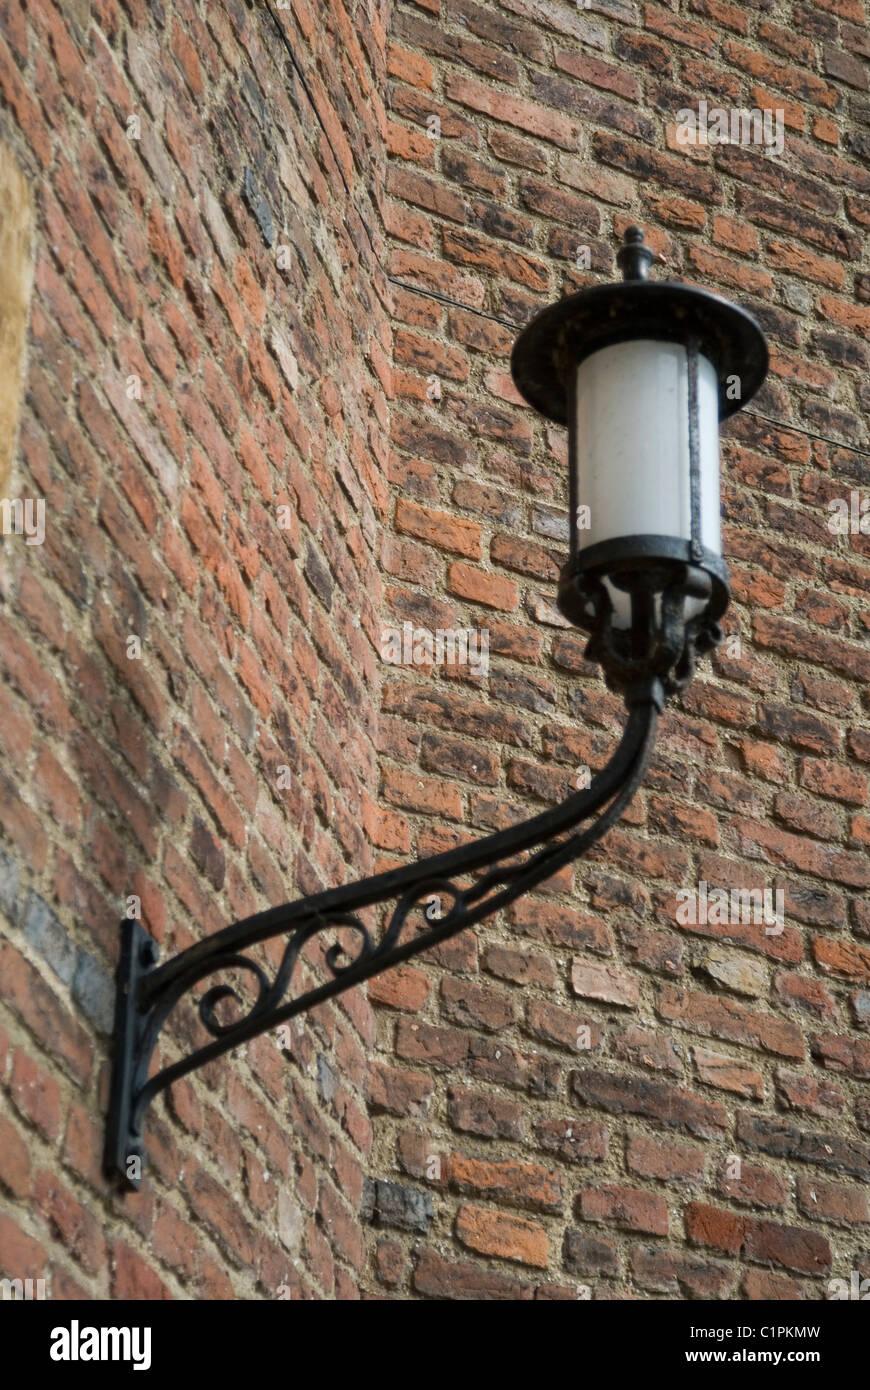 England, Cambridge, lamp on brick wall - Stock Image